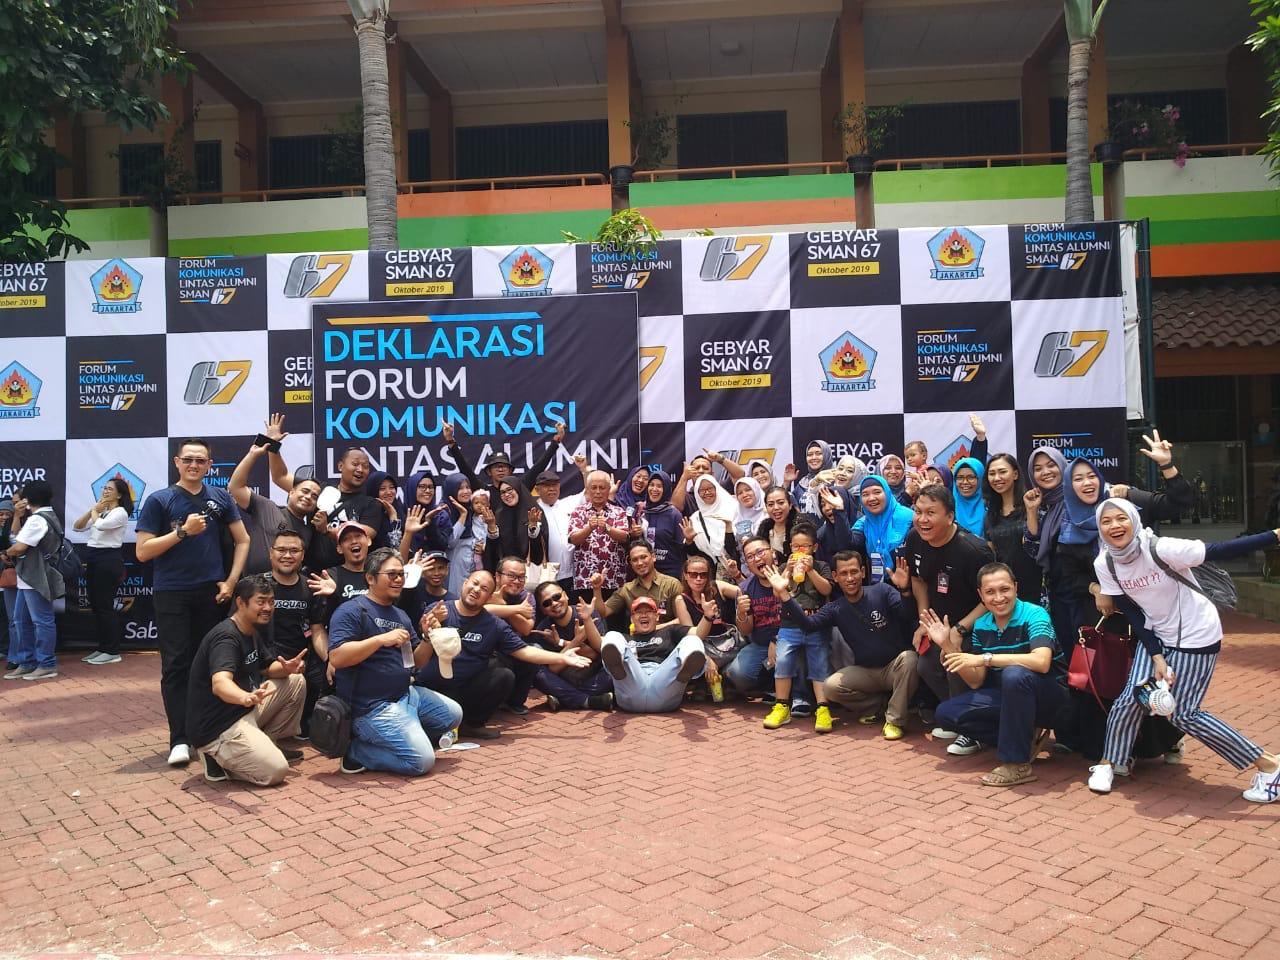 SMAN 67 Jakarta Deklarasikan Pendirian Forum Komunikasi Lintas Alumni